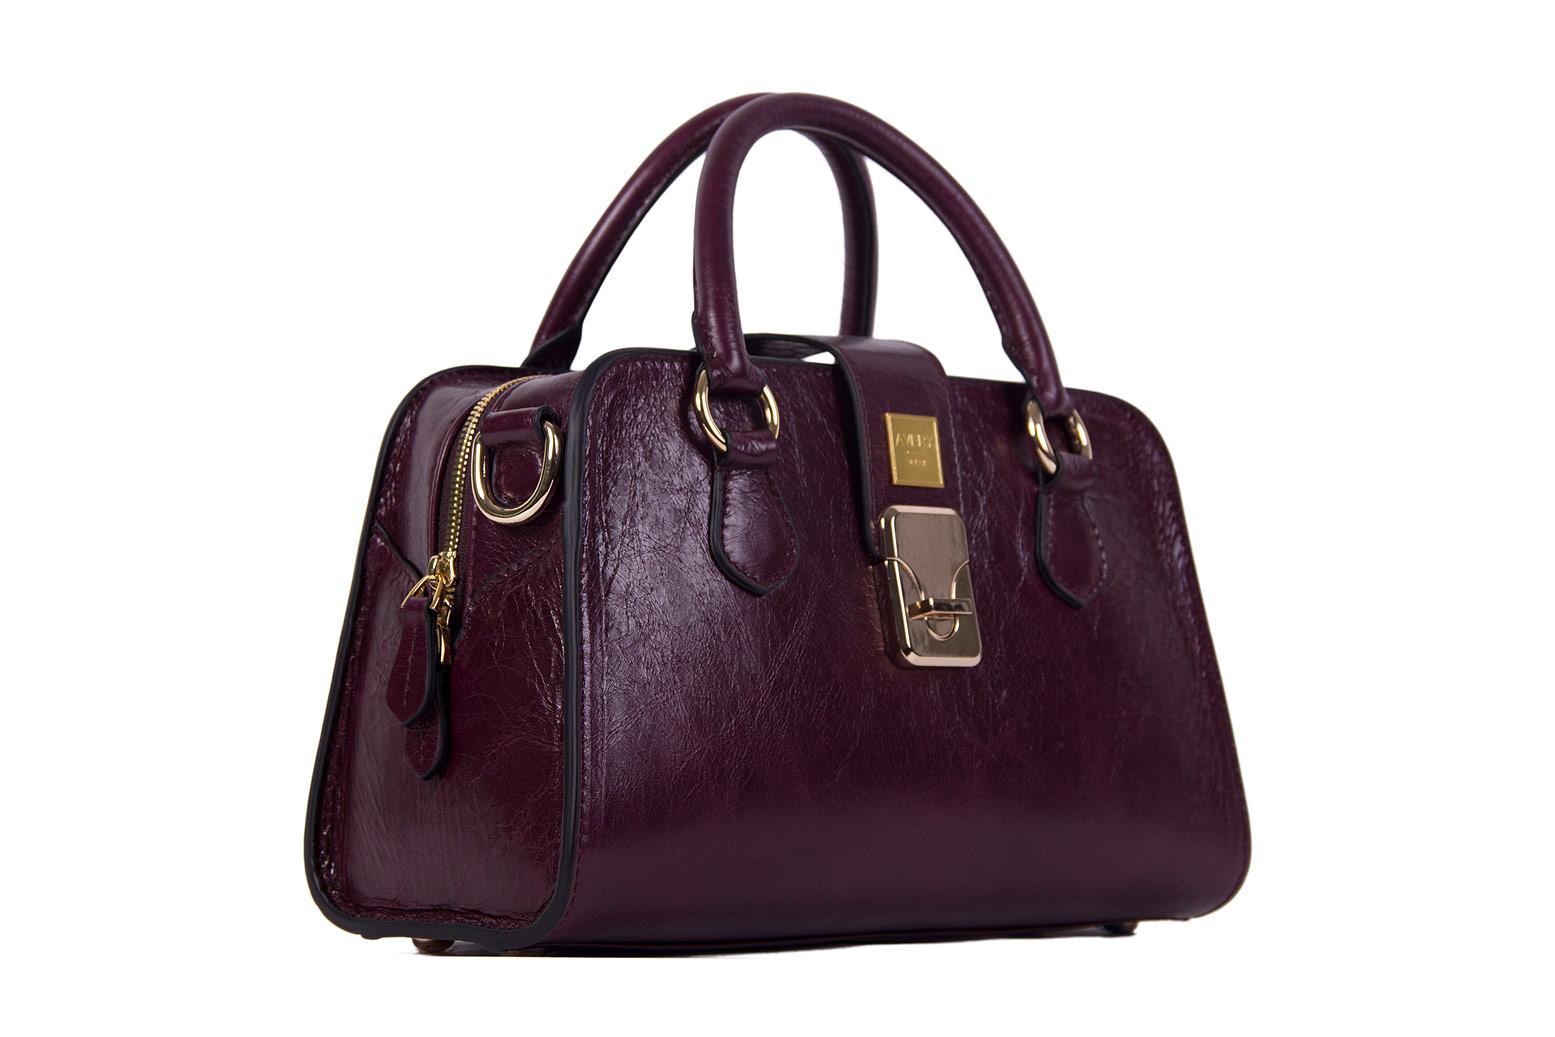 Avery Verse Sublime Handbag